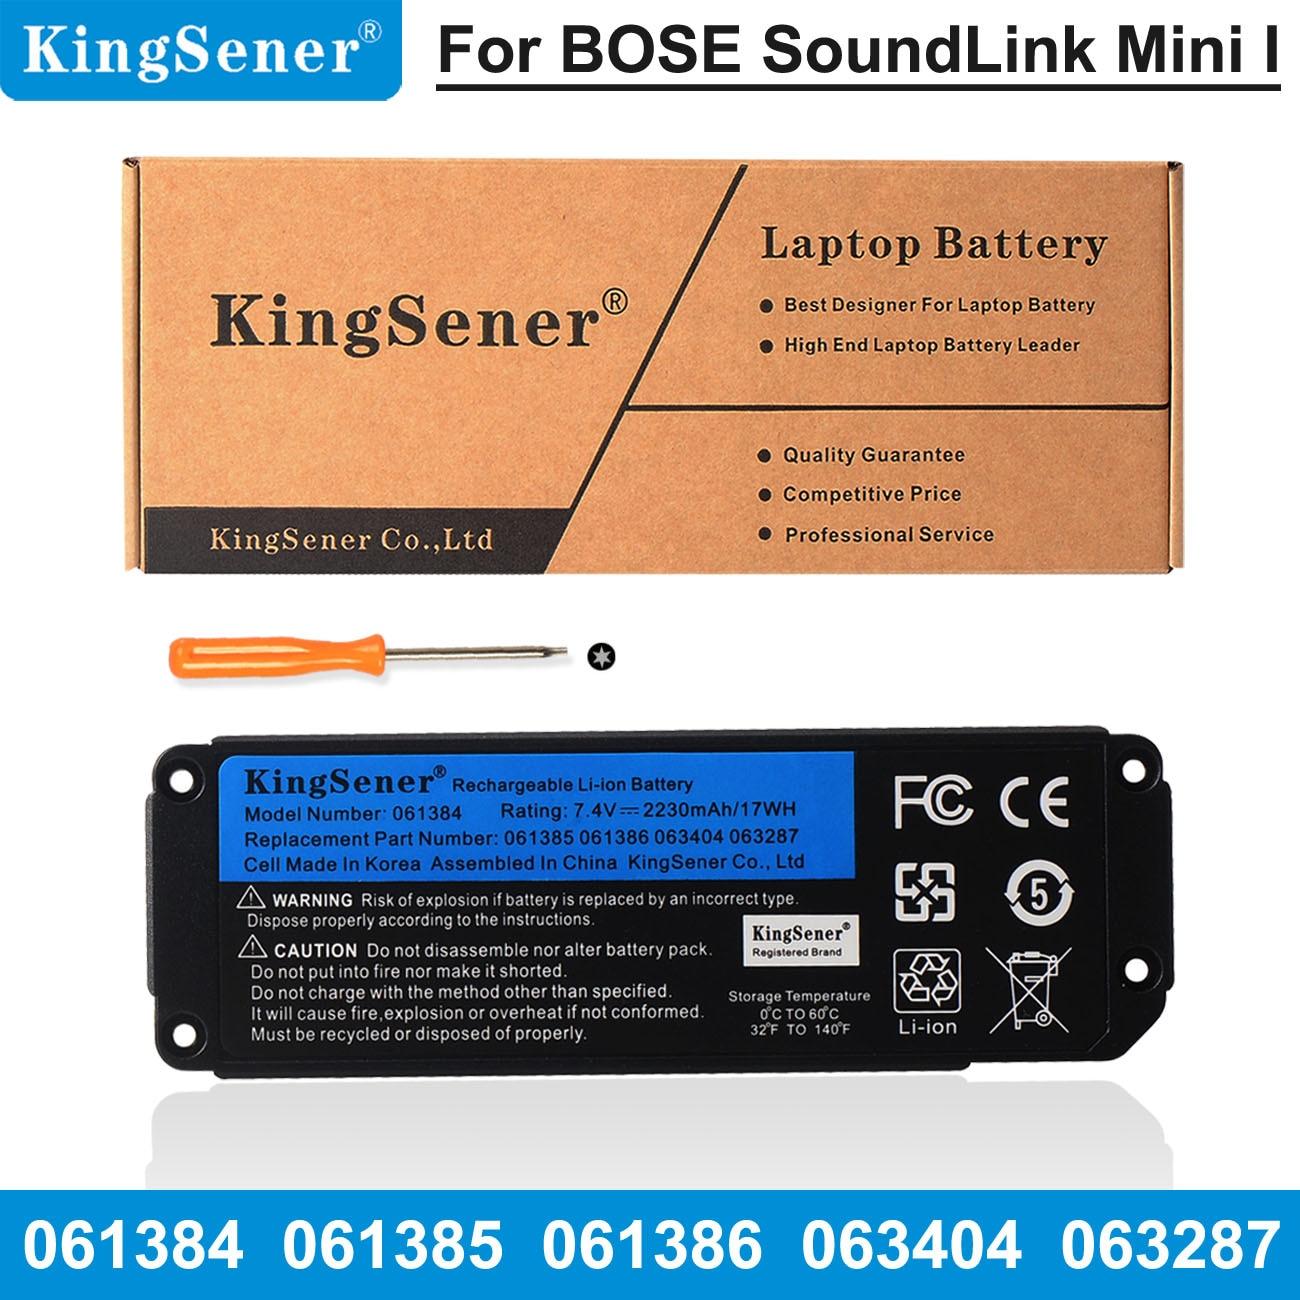 Аккумулятор Kingsener для Bluetooth-колонки BOSE SoundLink Mini I, 061384 в, 17 Вт/ч, 061385, 061386, 063404, 063287, 7,4